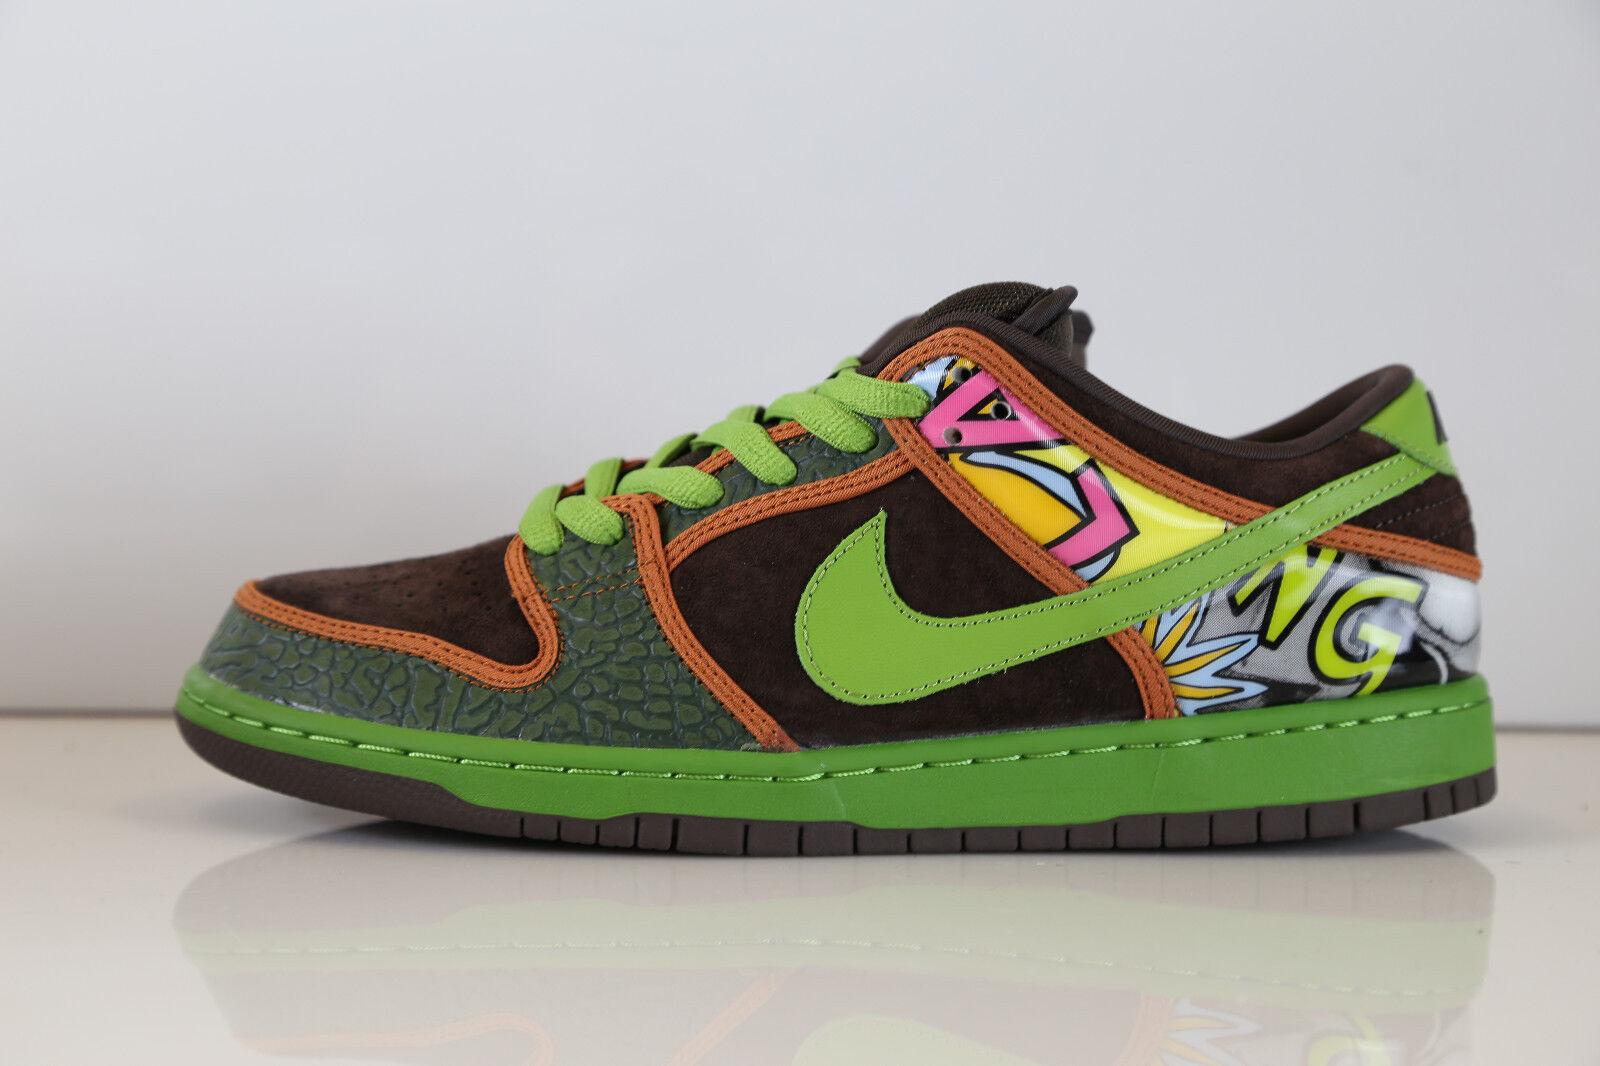 Nike Dunk Low Premium SB De La Soul 789841-332 4-13 supreme 1 hi  5